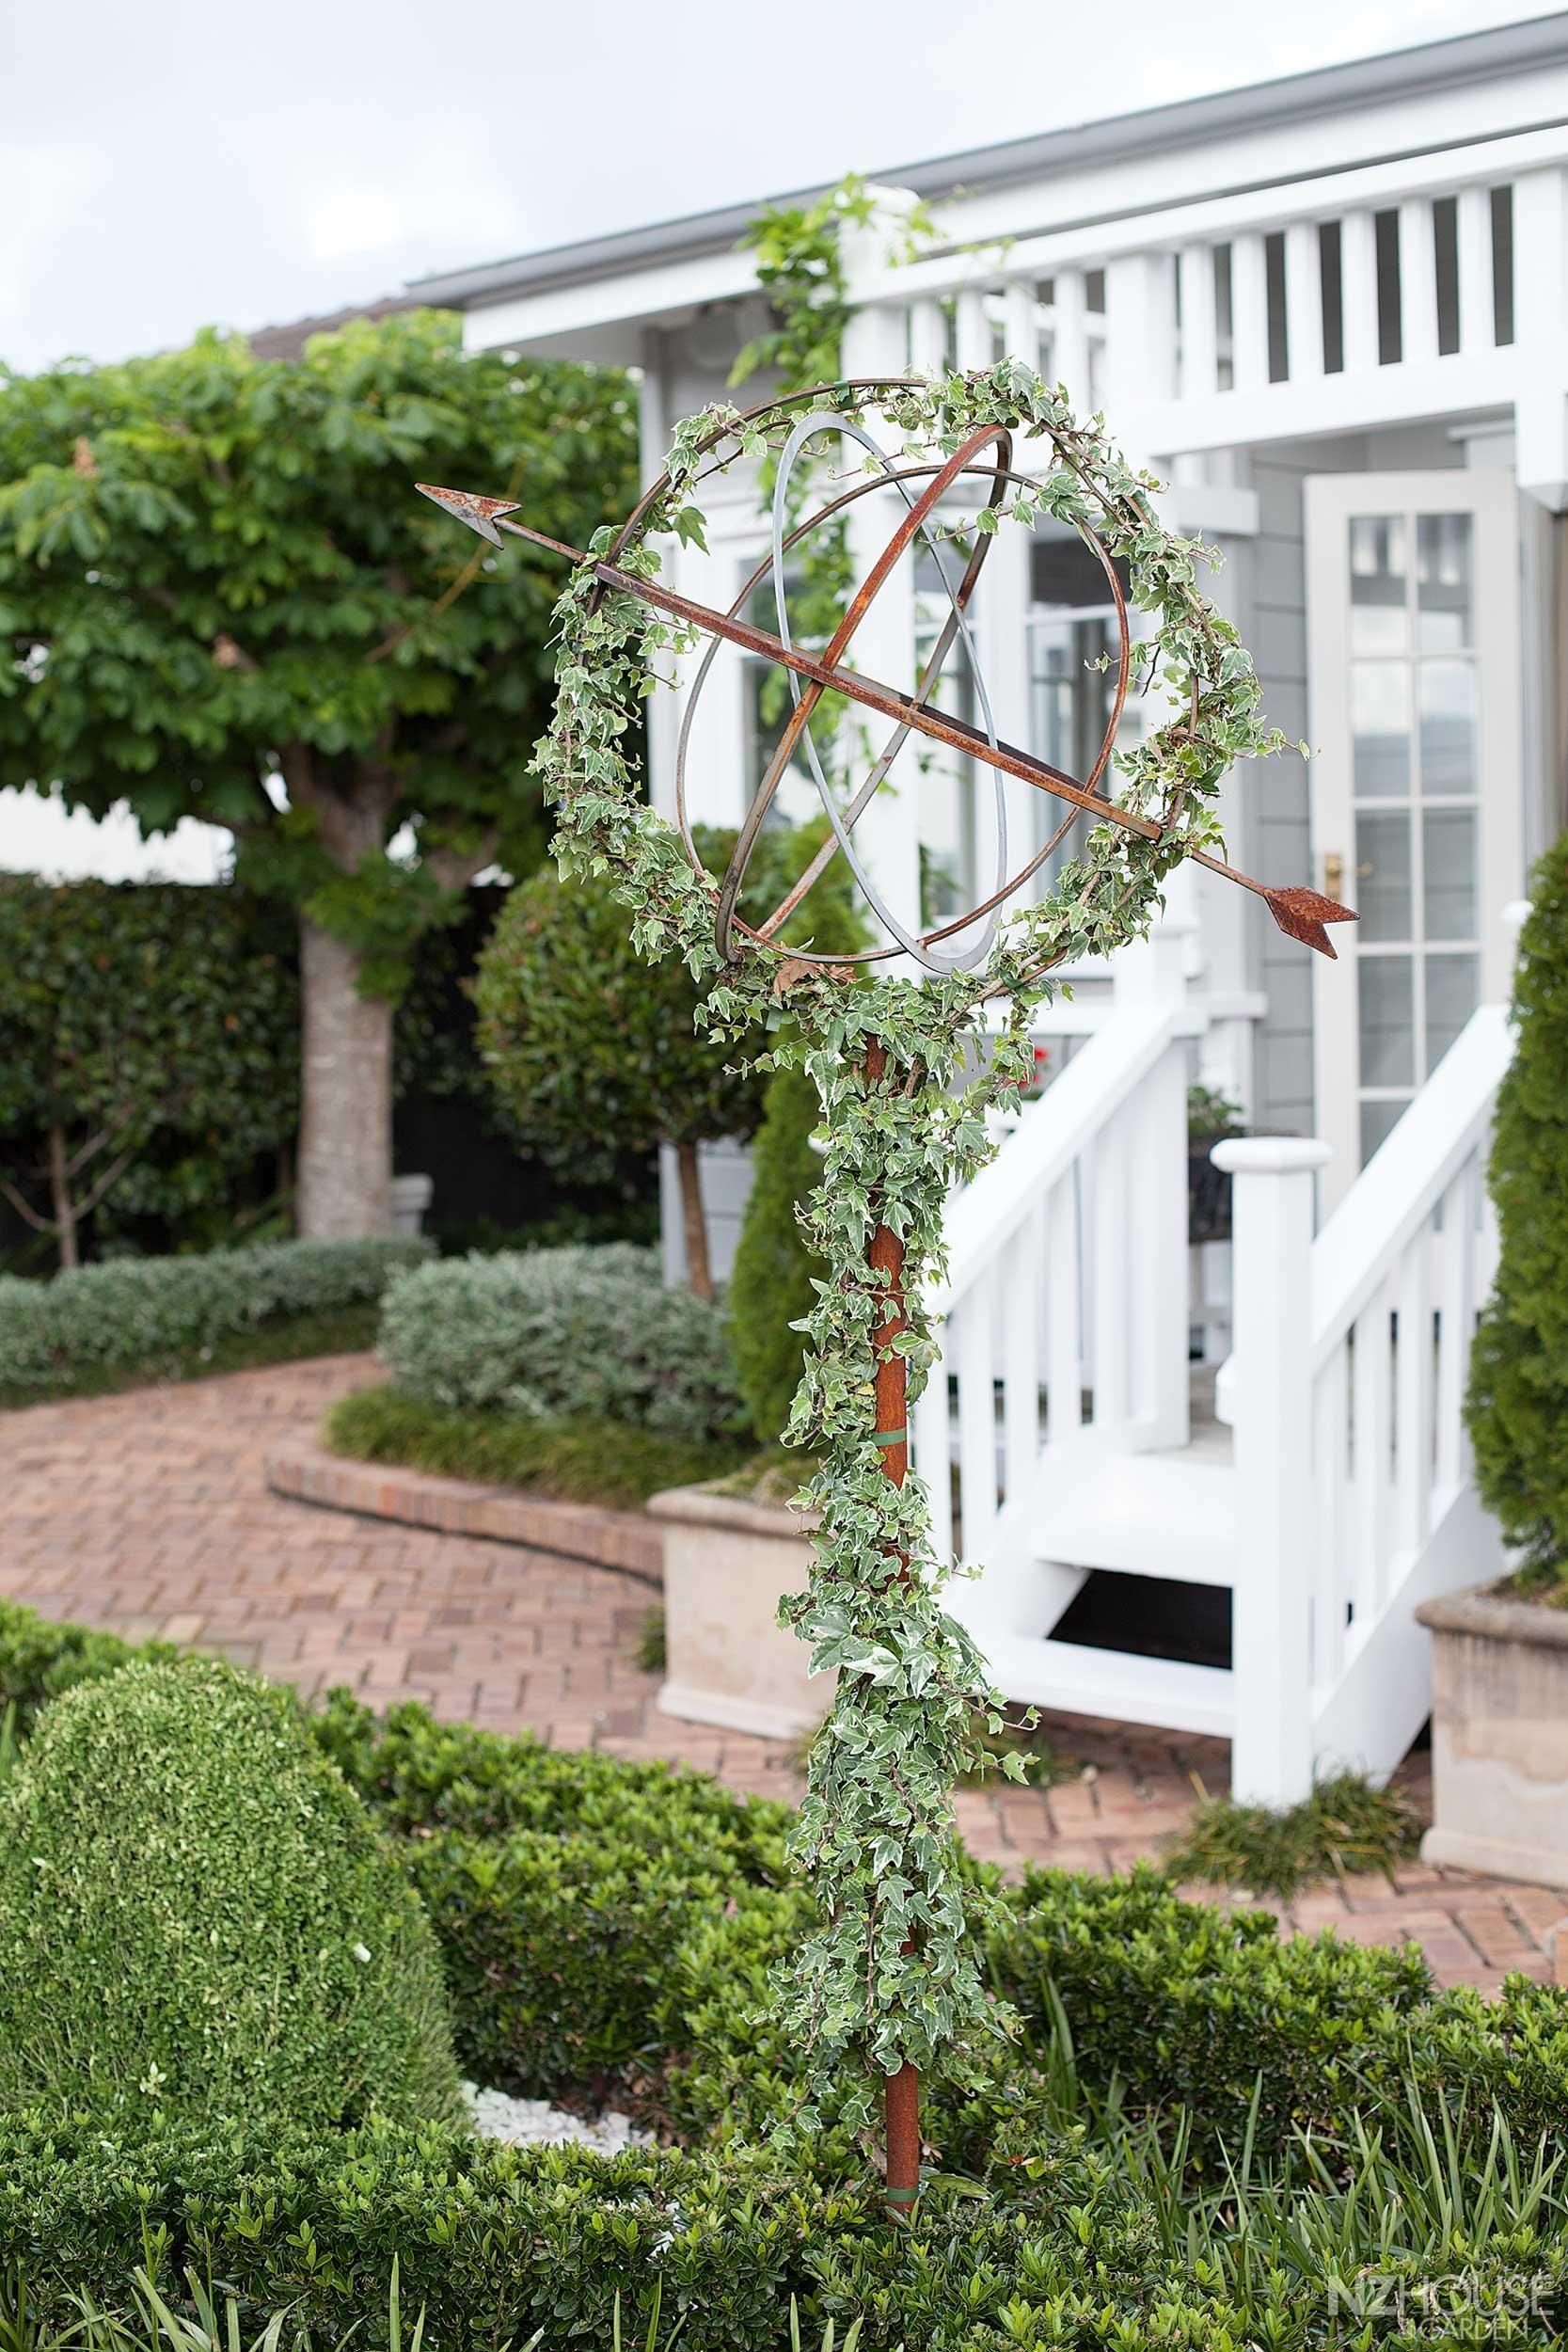 Tauranga Garden Takes Cue From Europe Nz House And Garden Landscape Decor Beautiful Gardens Garden Pottery